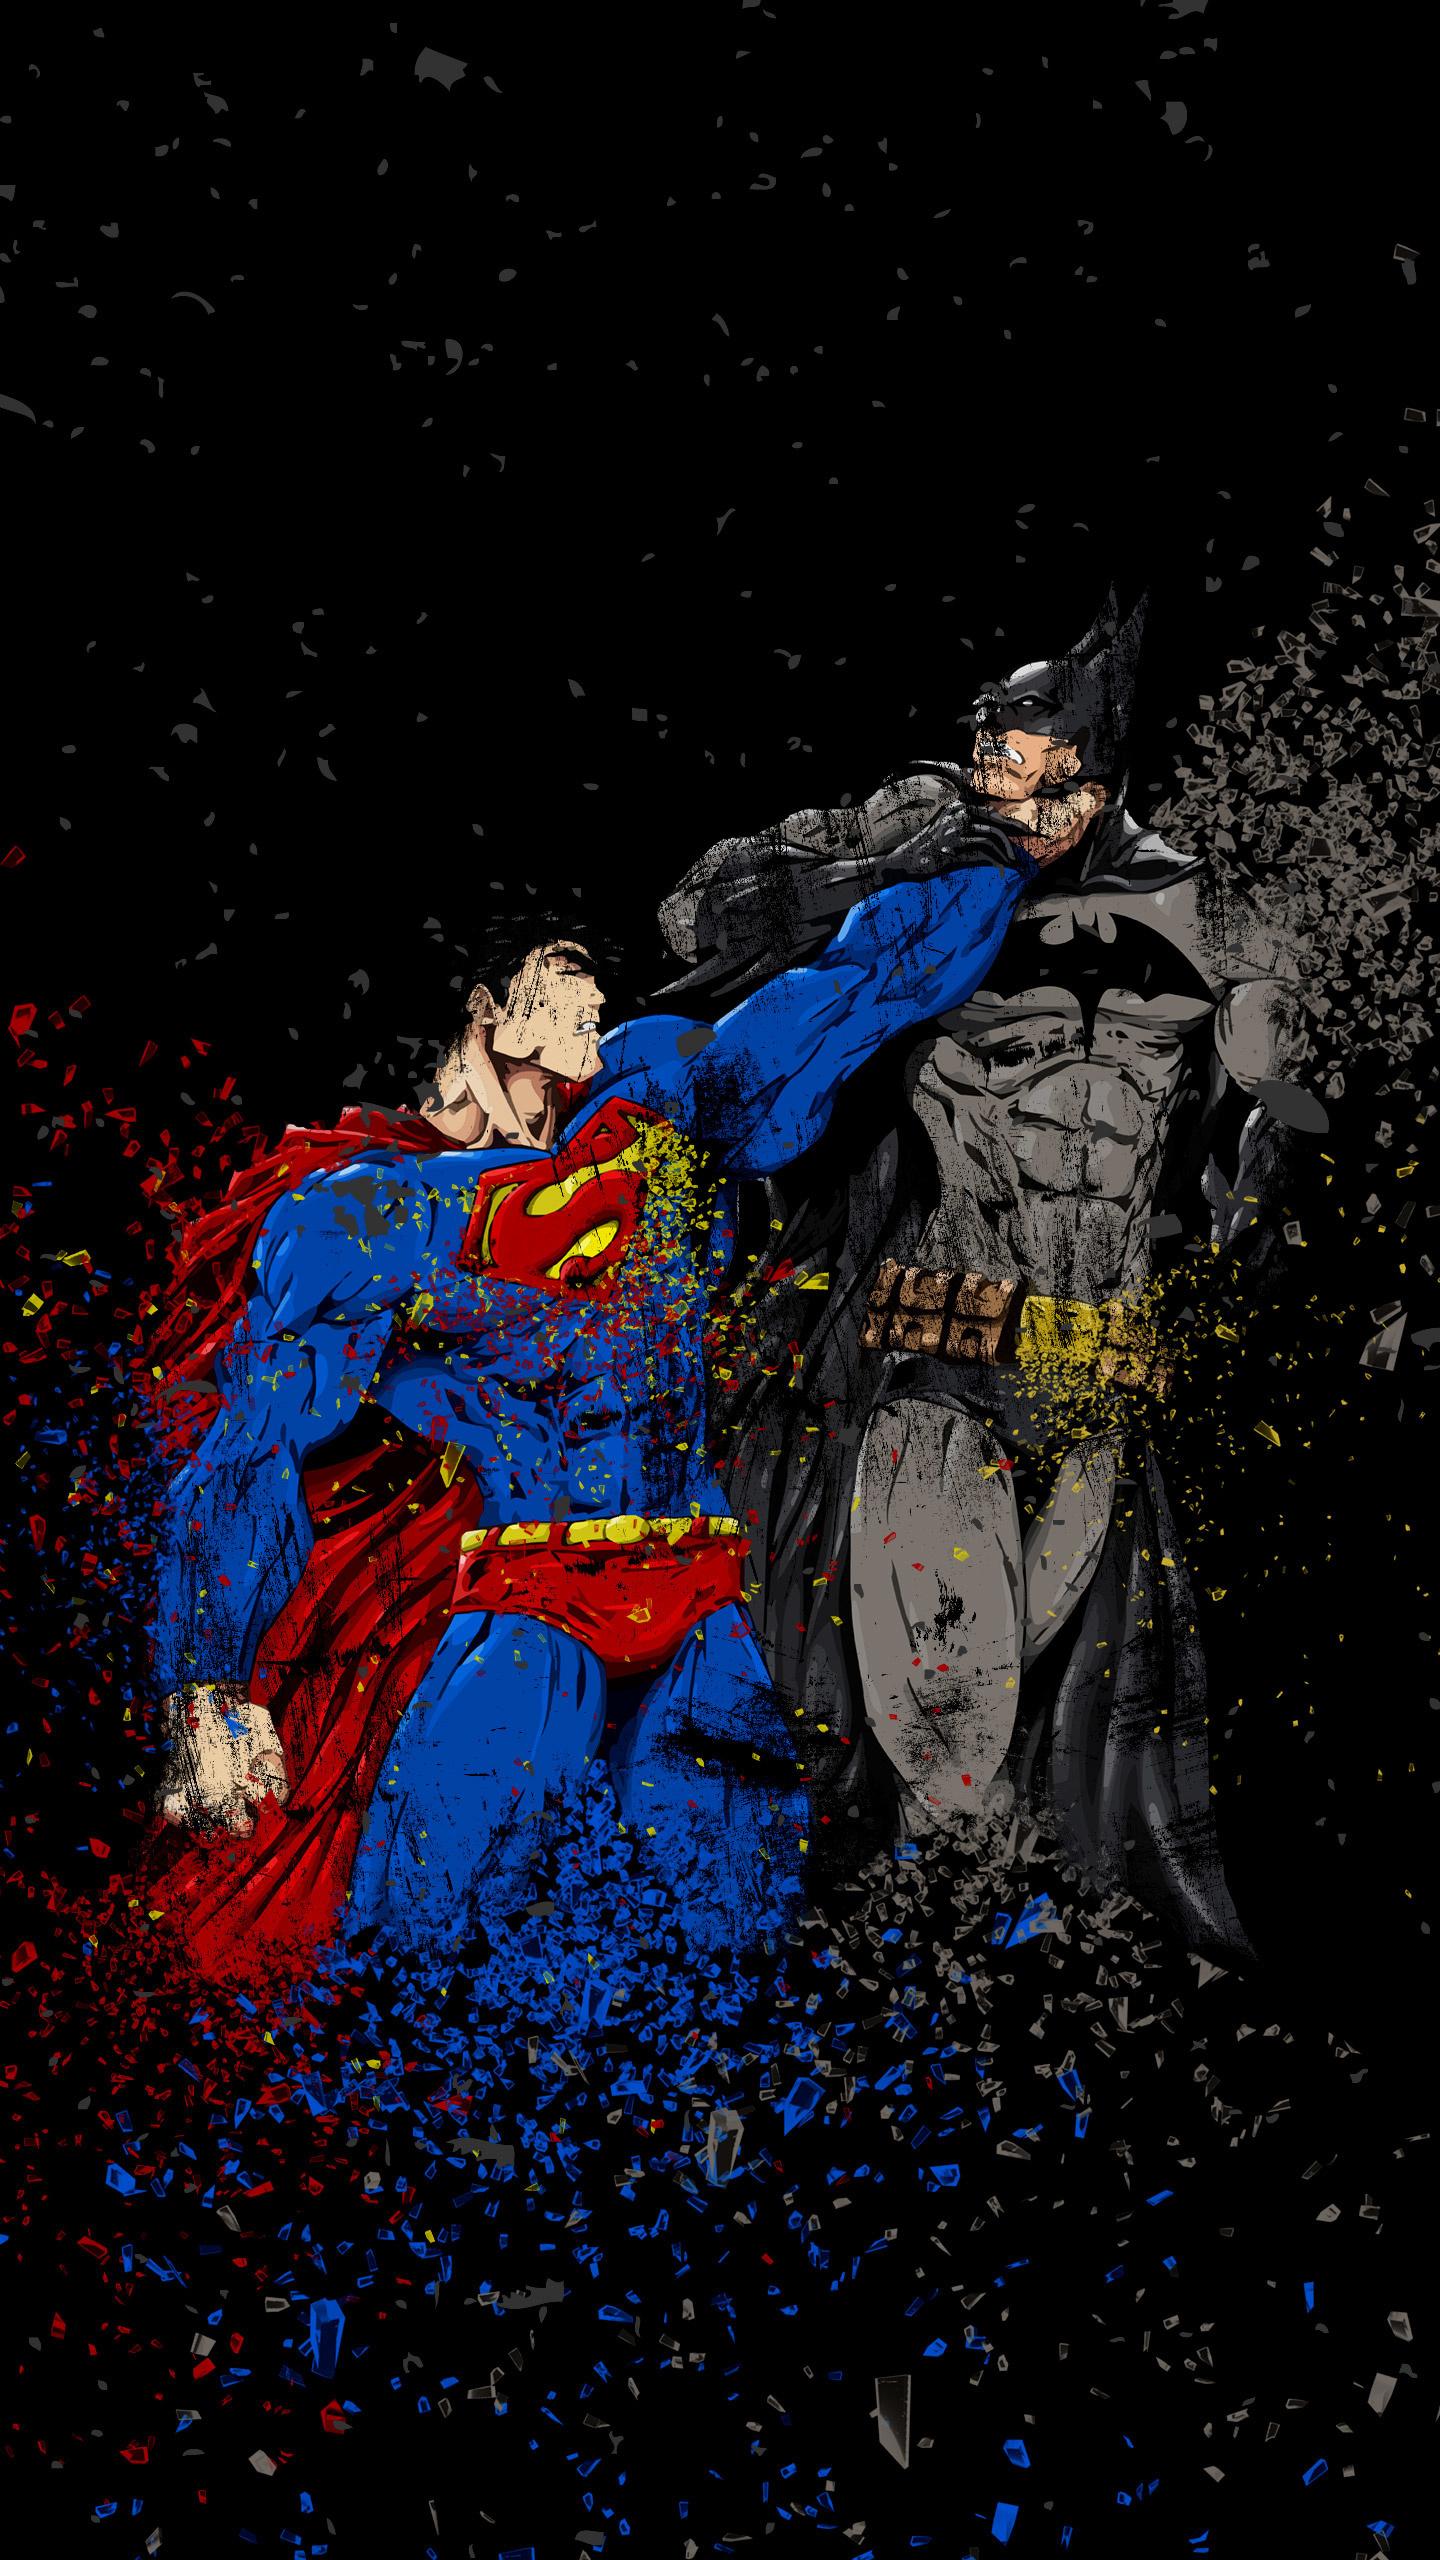 Batman Vs Superman, Ruggon Style, Art, Wallpaper - Iphone 7 Superman Wallpaper Hd - HD Wallpaper